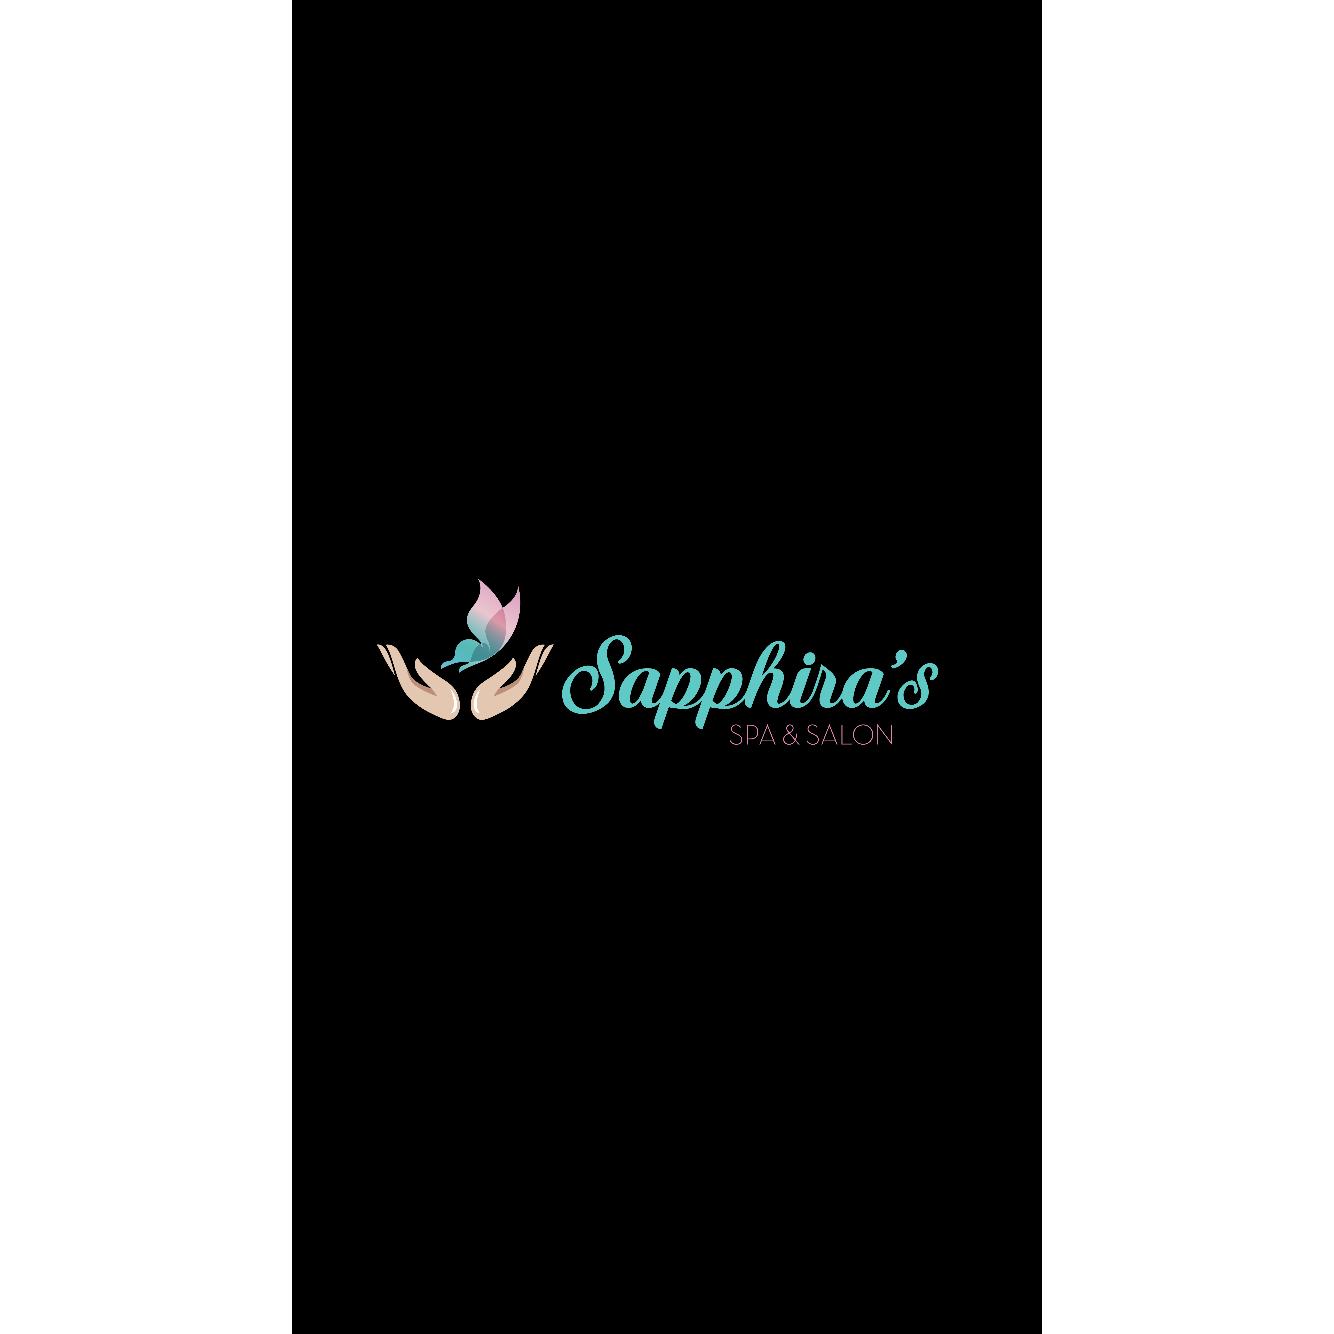 Sapphira's Spa & Salon image 1